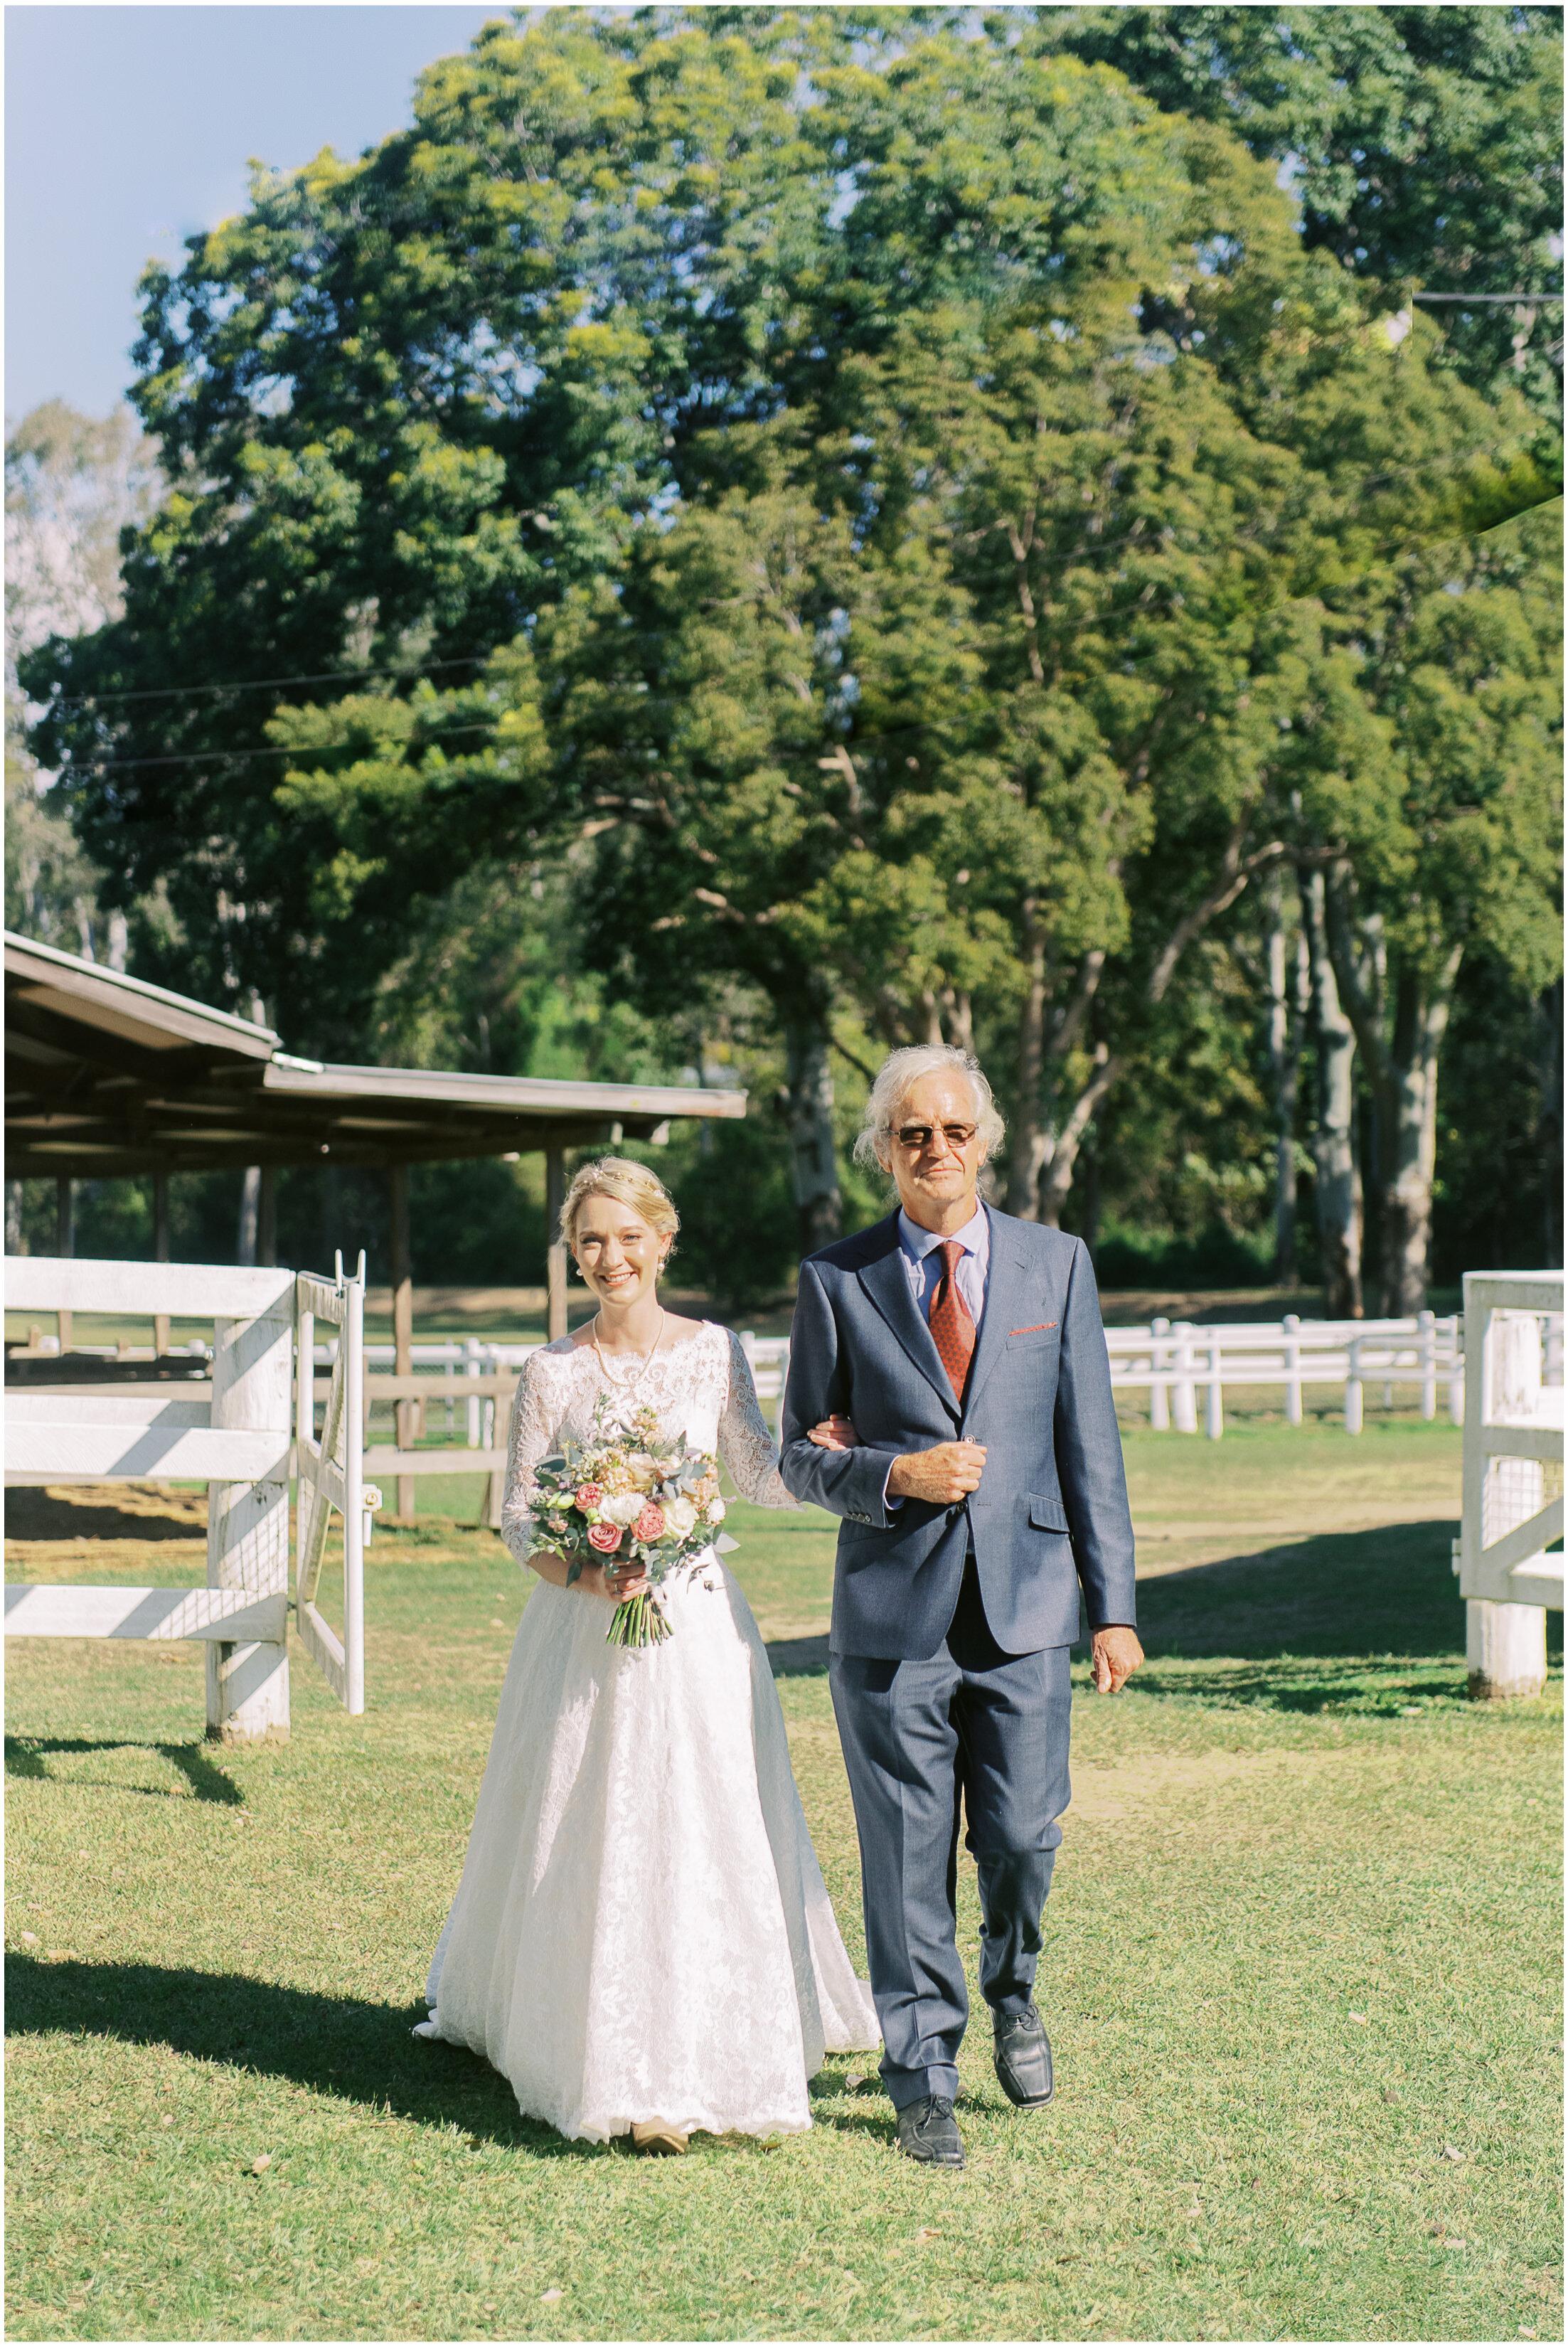 brisbane-fine-art-wedding-photographer-lauren-olivia-luxury-wedding-australia-05.jpg